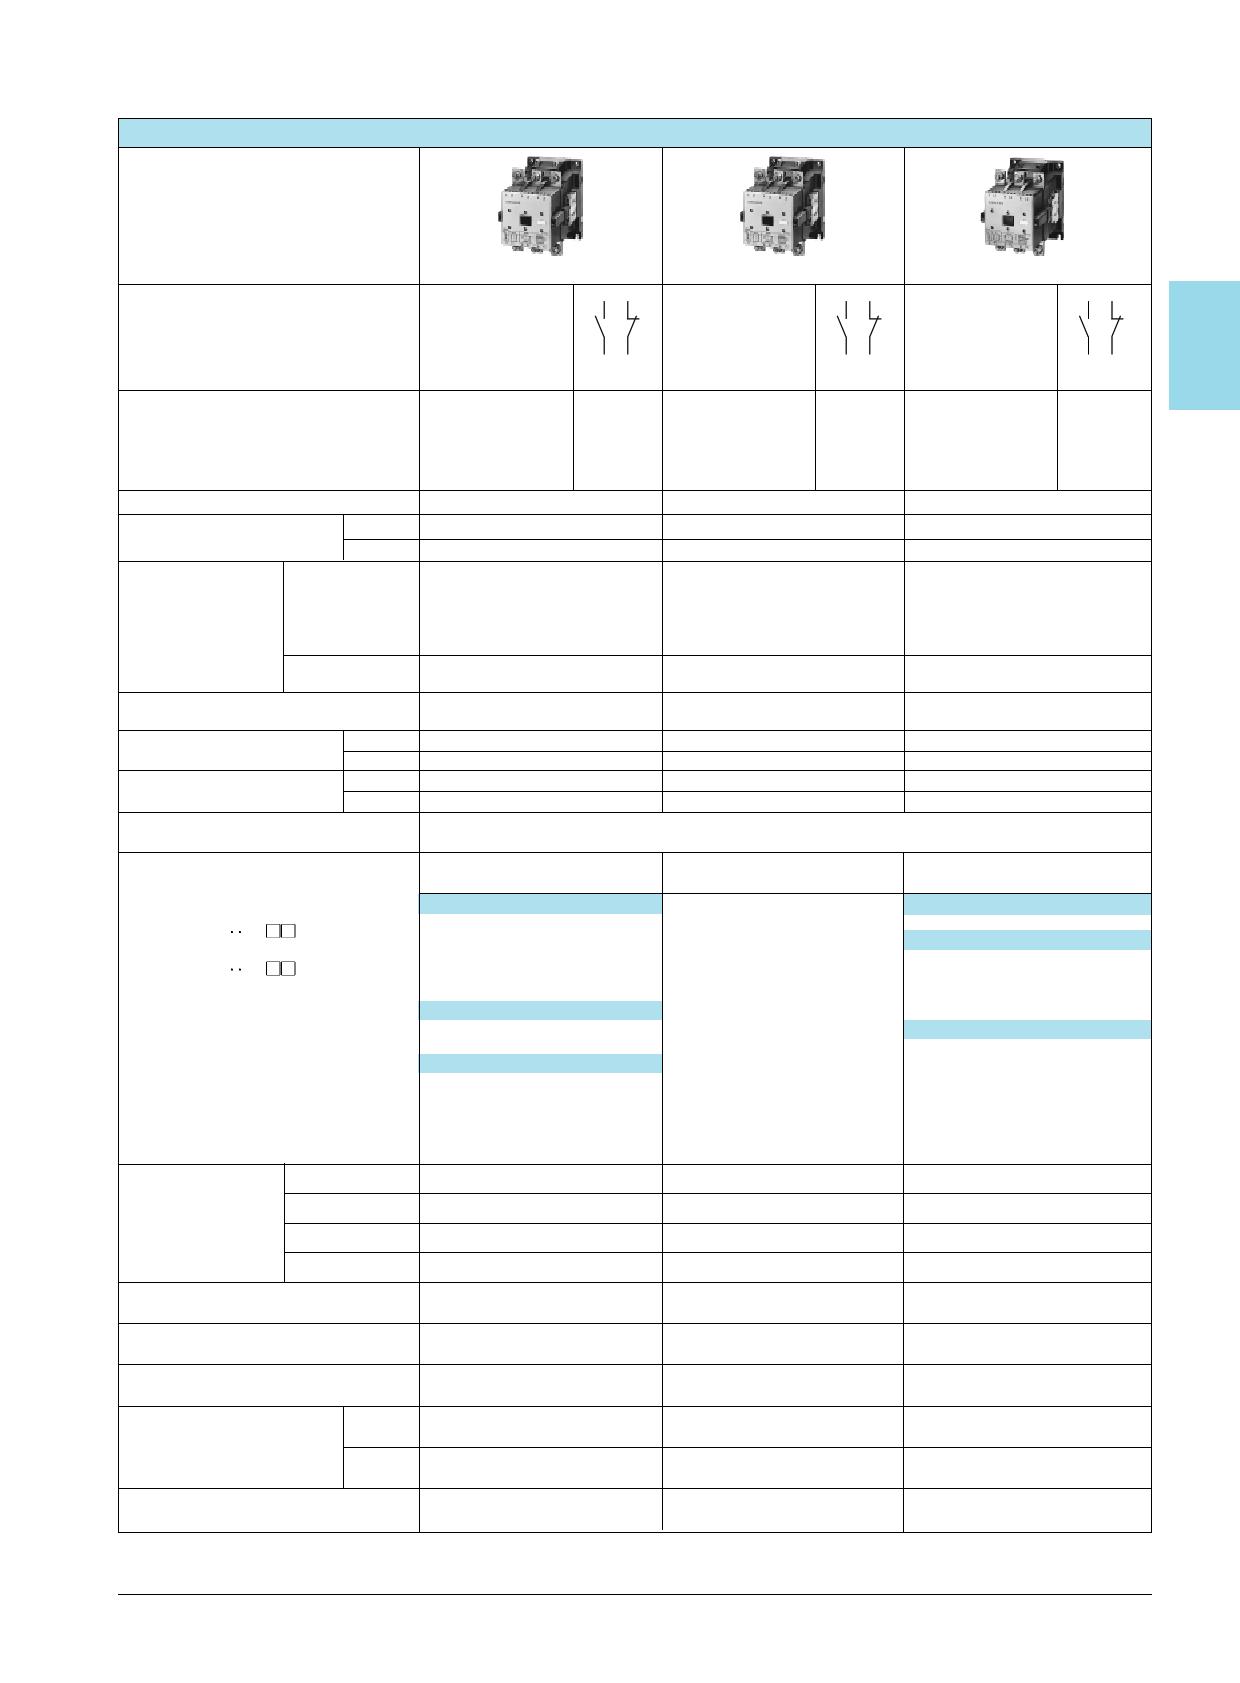 3TF35 Datasheet, Funktion